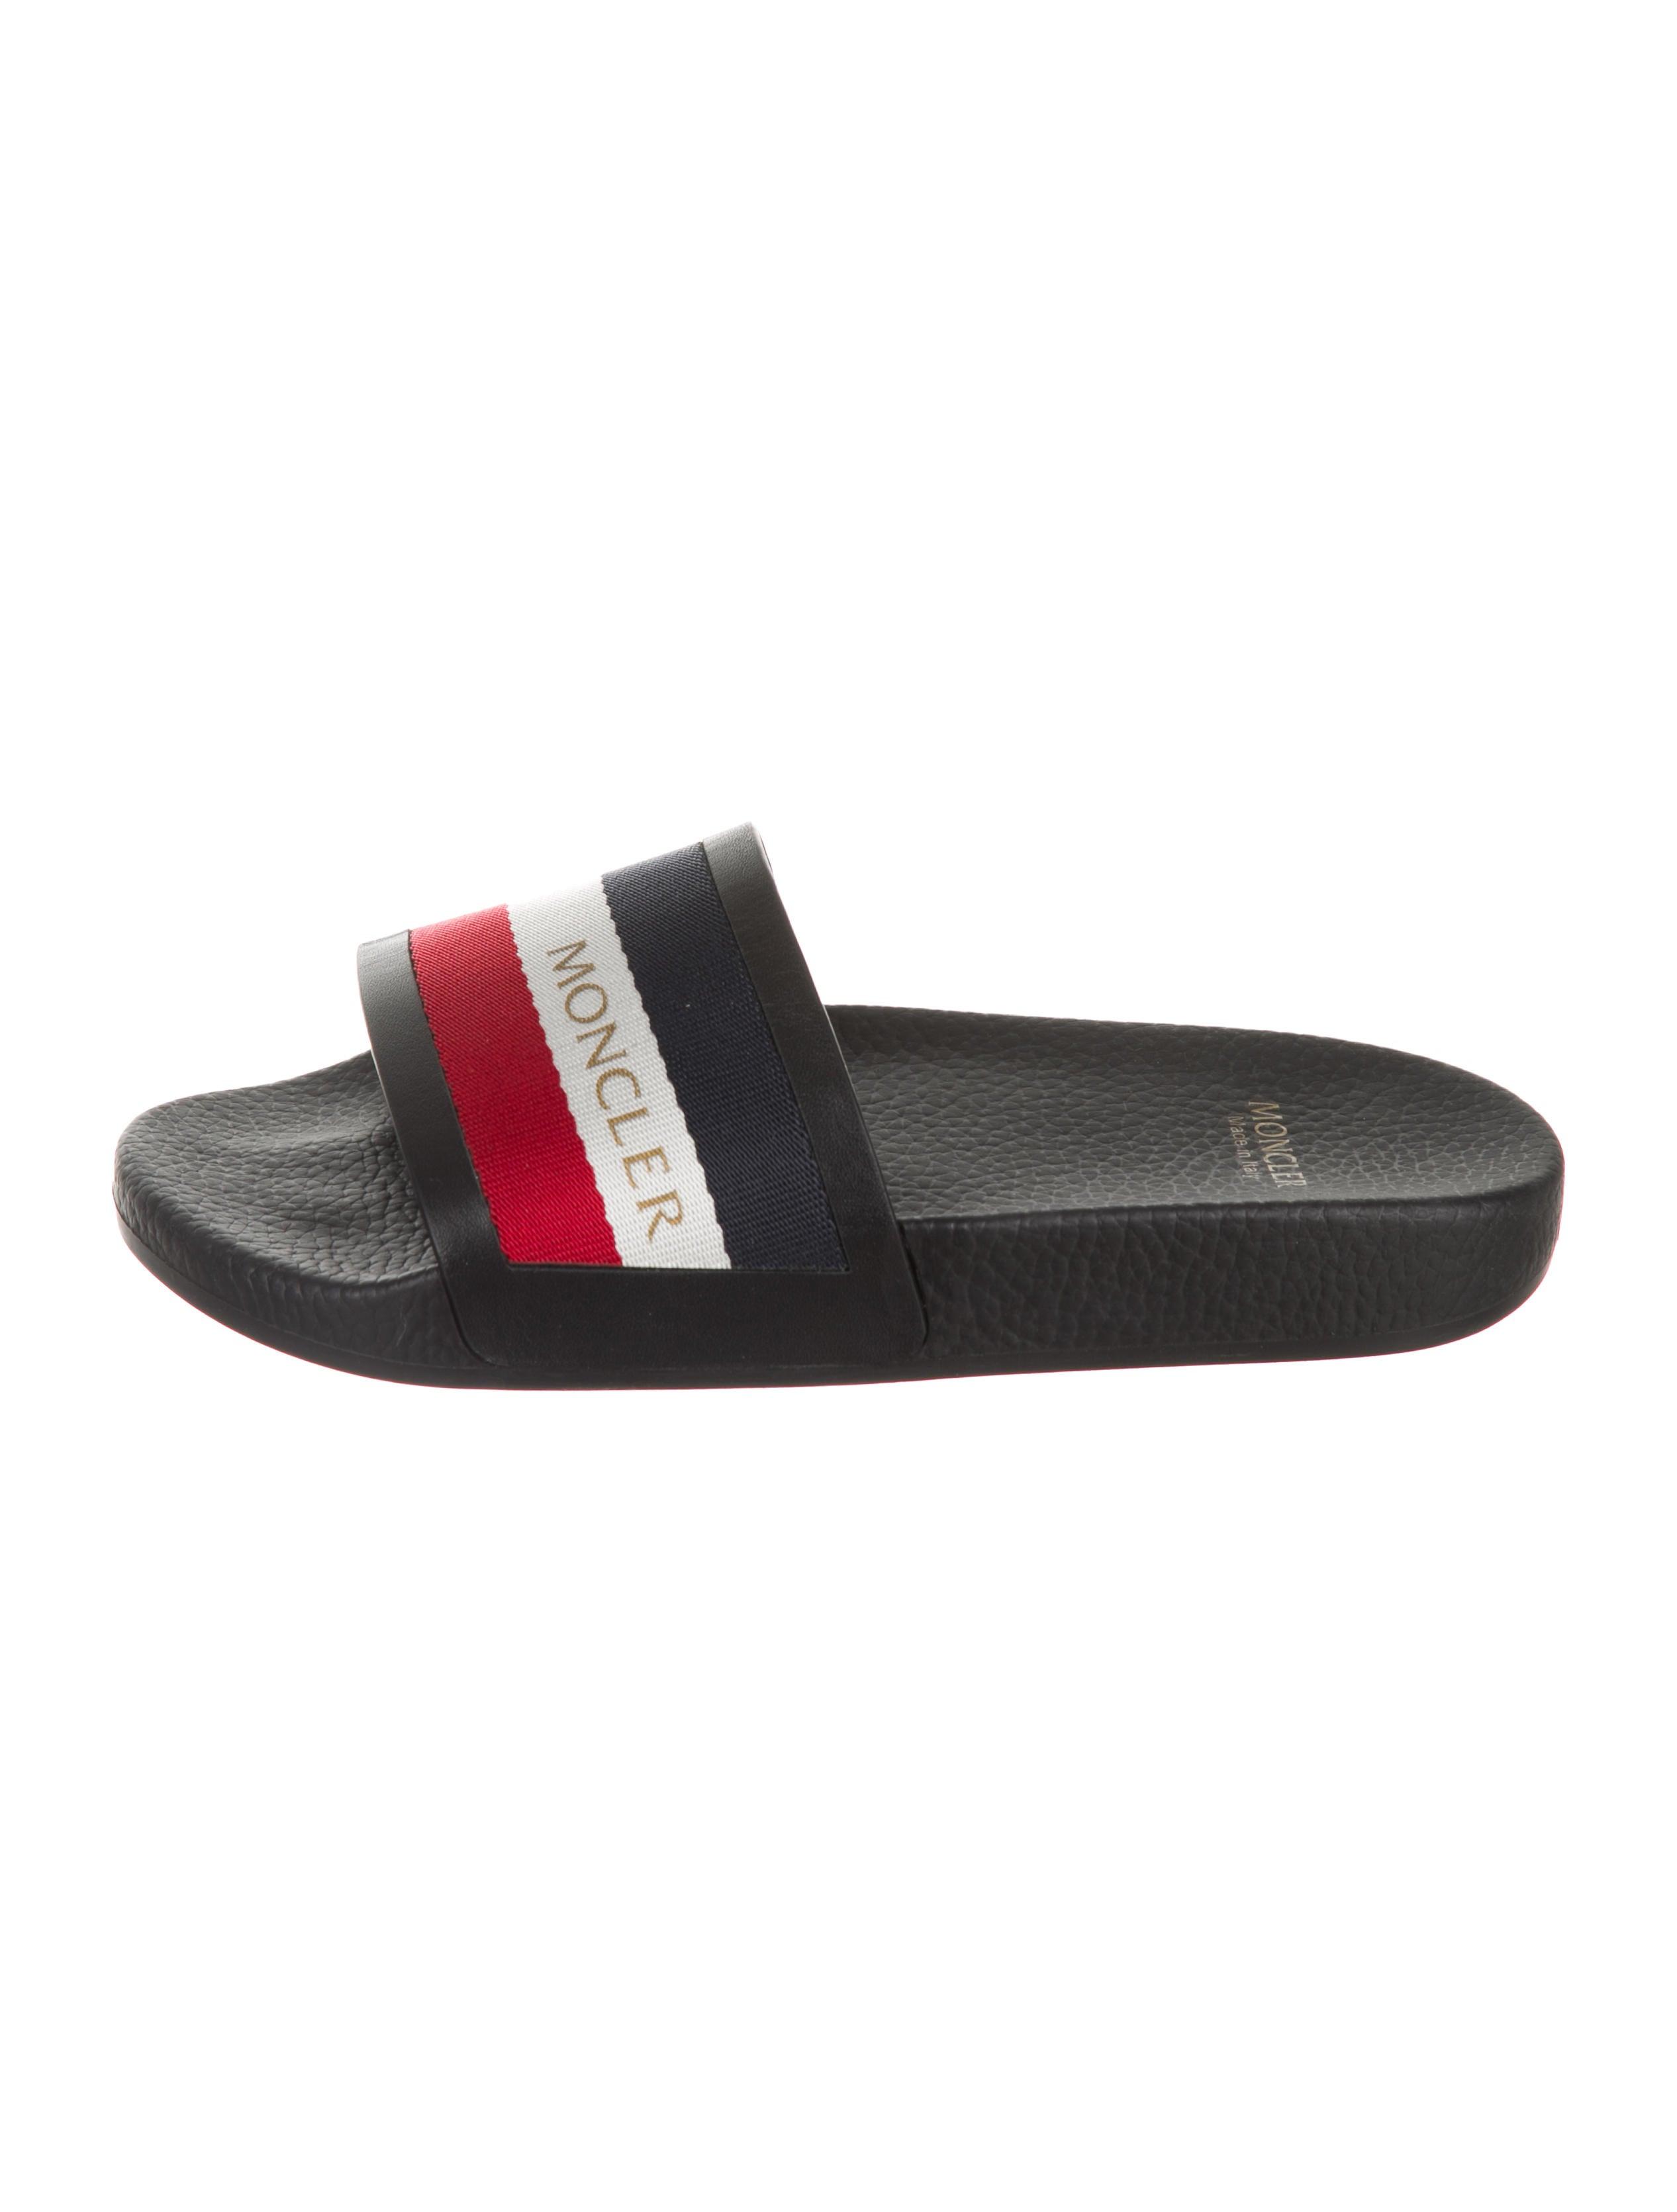 32be7609fb93 Moncler Basile Striped Slides - Shoes - MOC34243